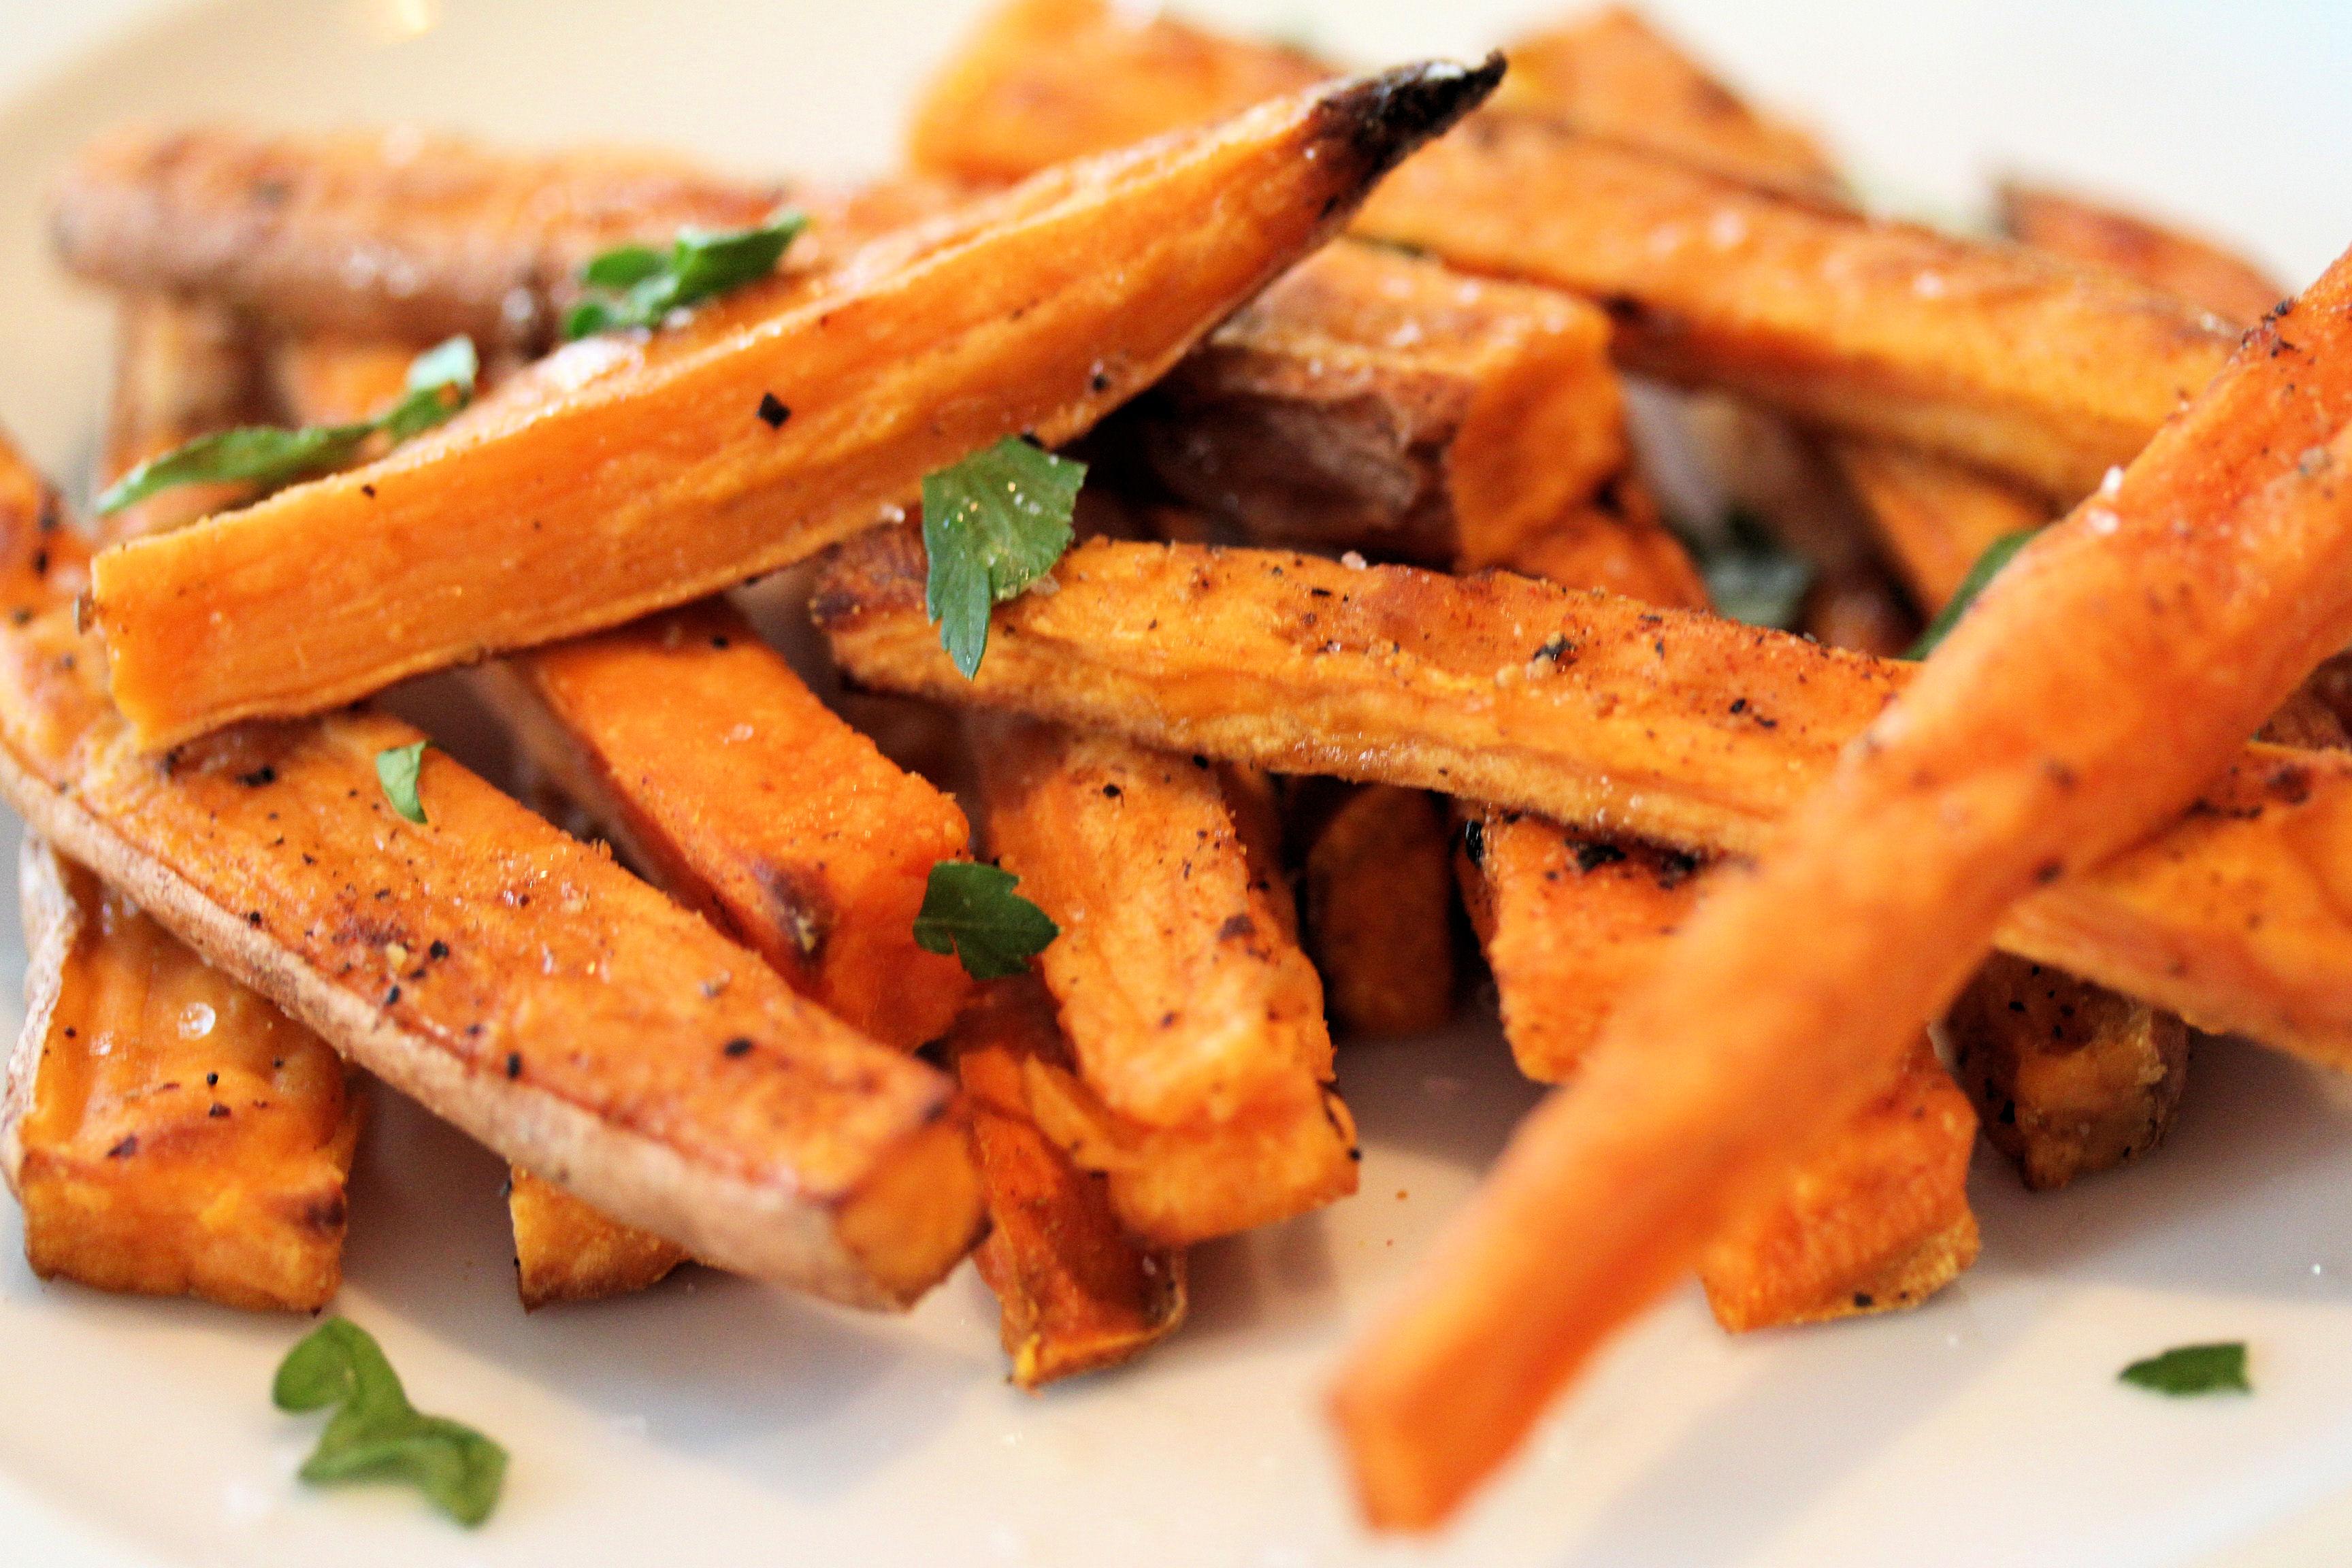 sweet-potato-fries-31